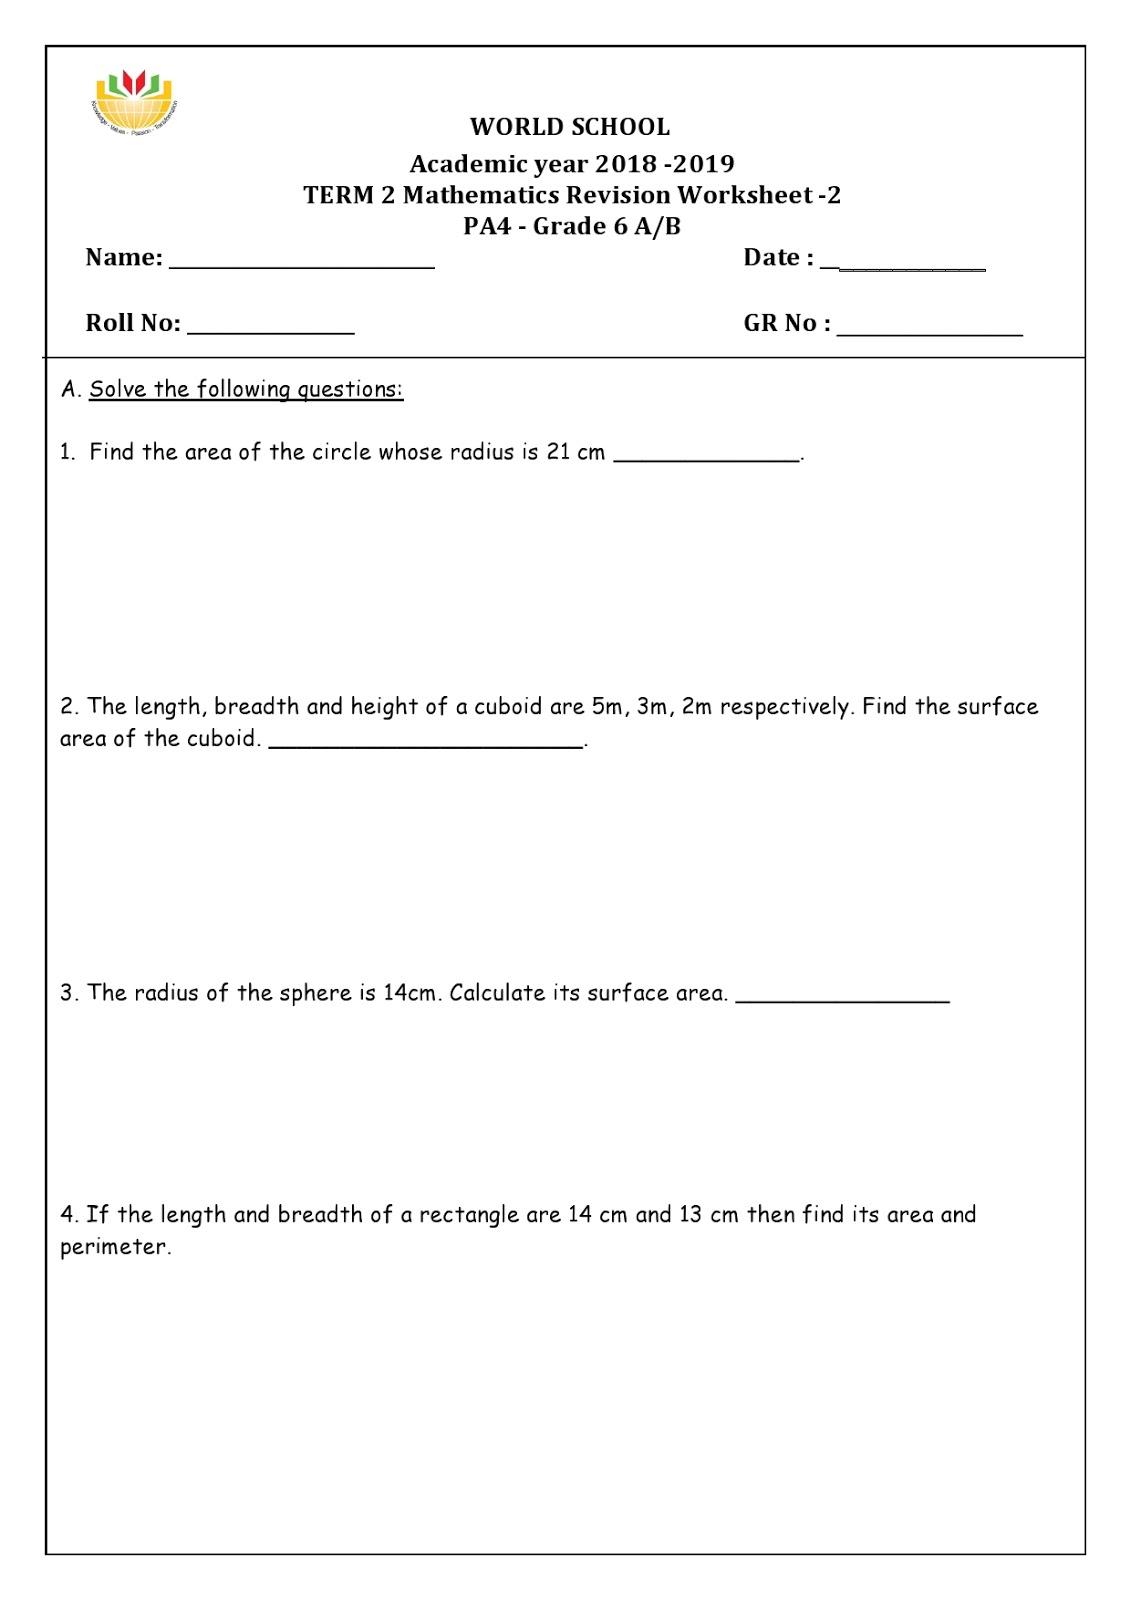 hight resolution of WORLD SCHOOL OMAN: Homework for Grade 6 as on 18-04-2019